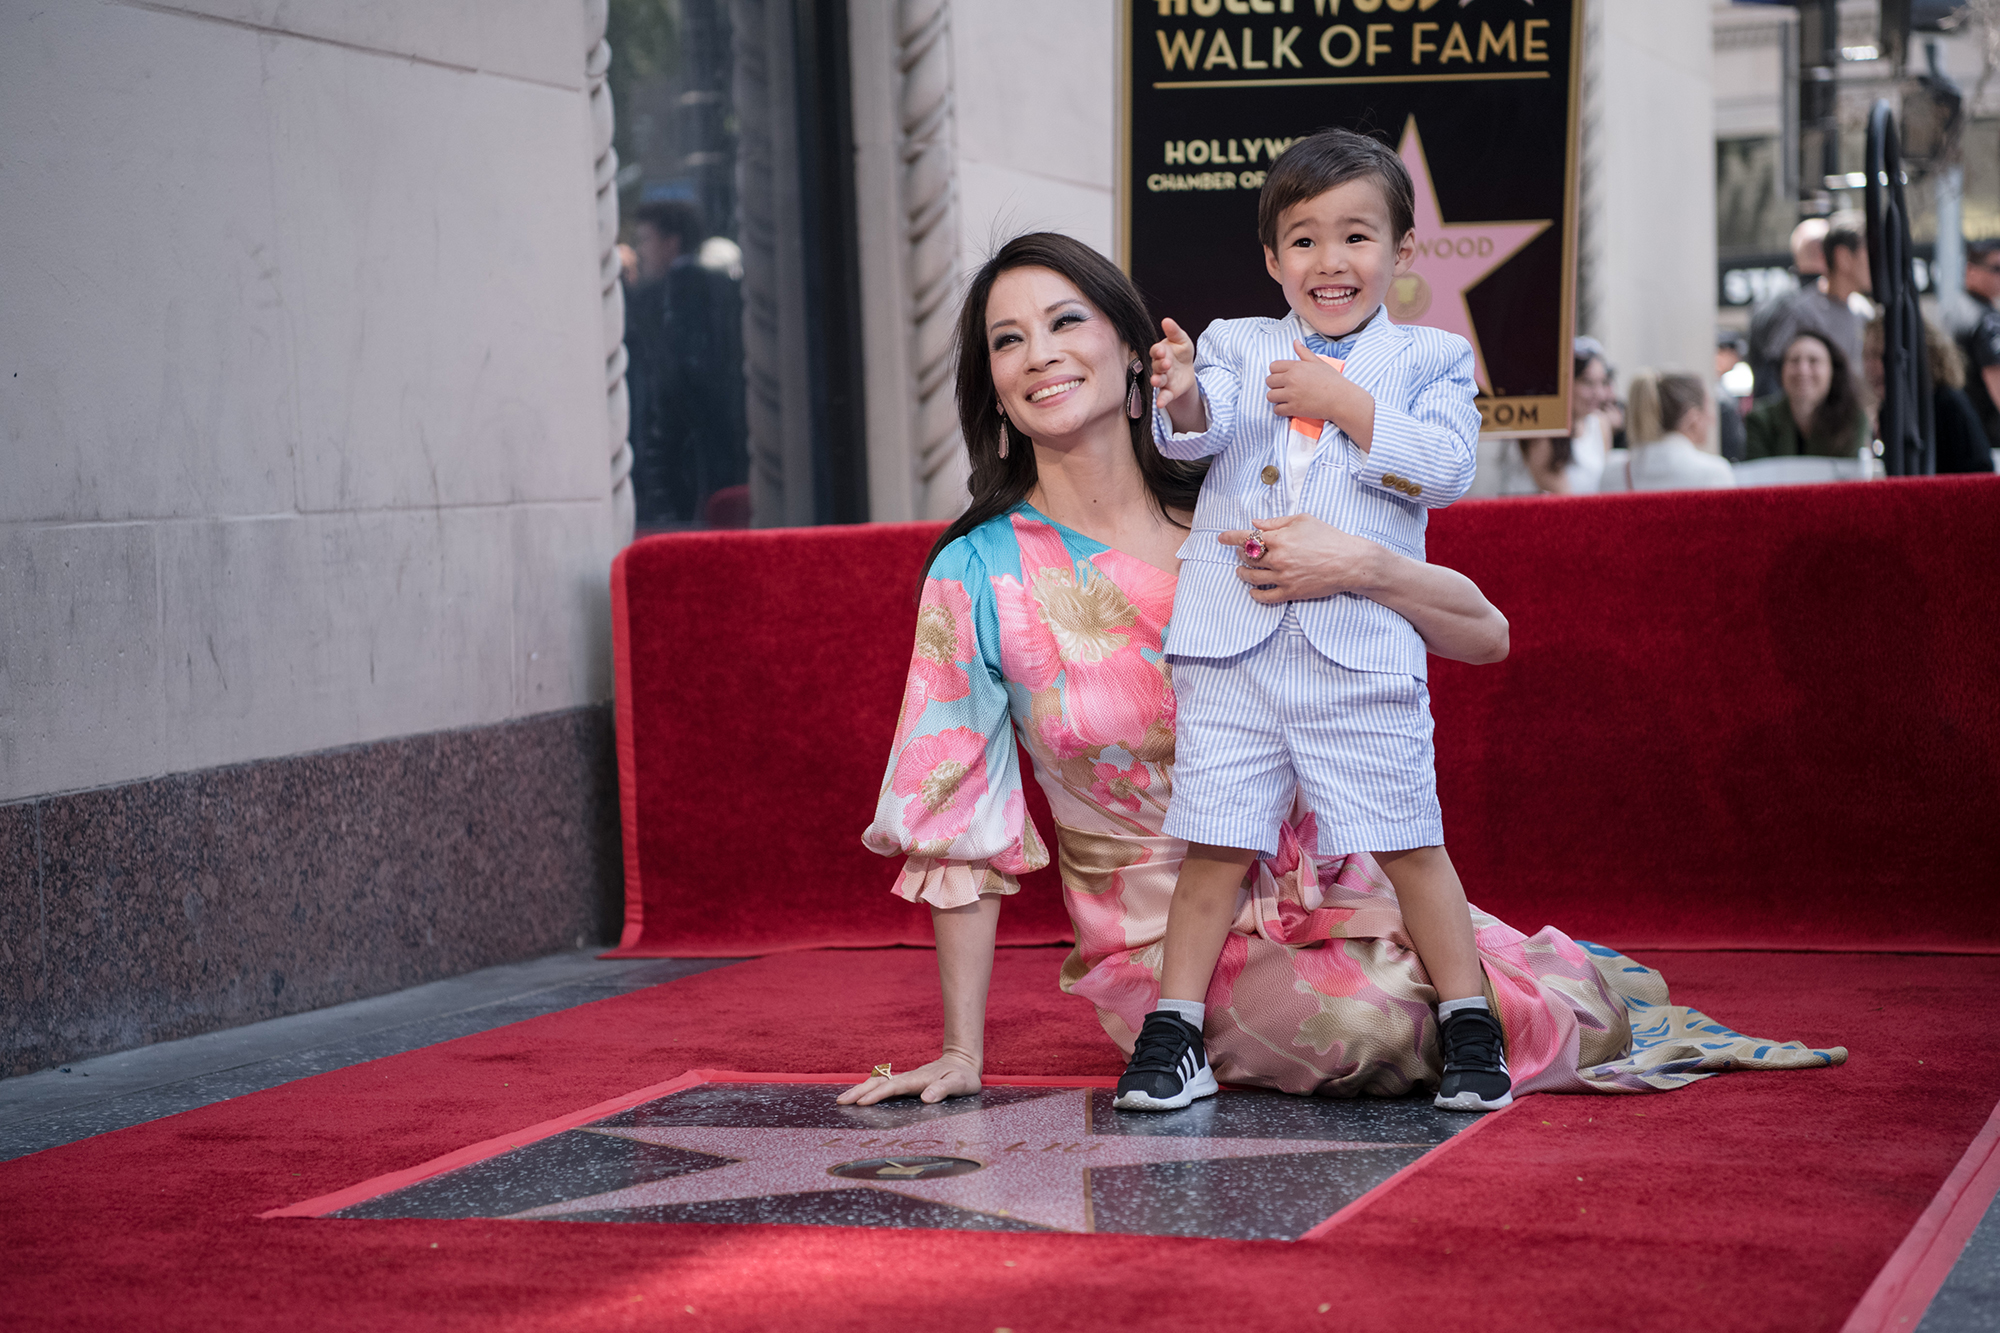 Charlie's Angels Cameron Diaz Drew Barrymore Demi Moore Lucy Liu Walk of Fame - Liu announced in August 2015 that she welcomed Rockwell via surrogate .